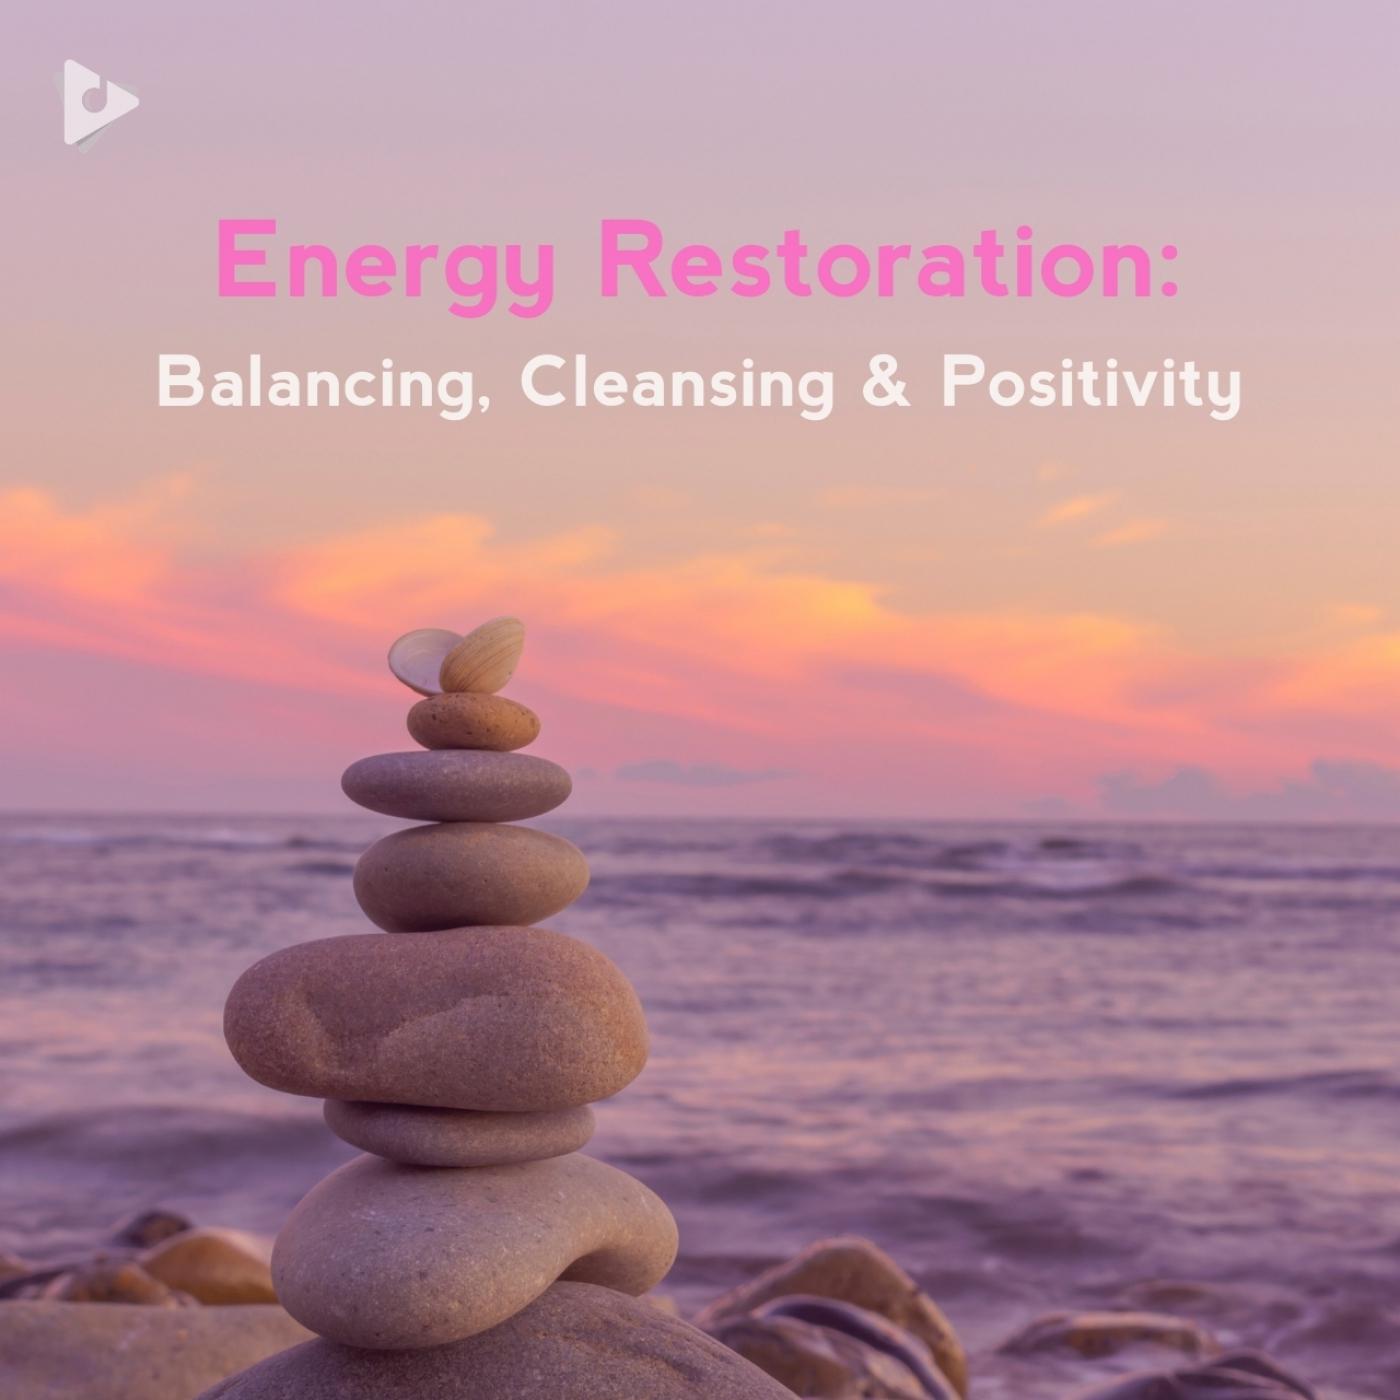 Energy Restoration: Balancing, Cleansing & Positivity